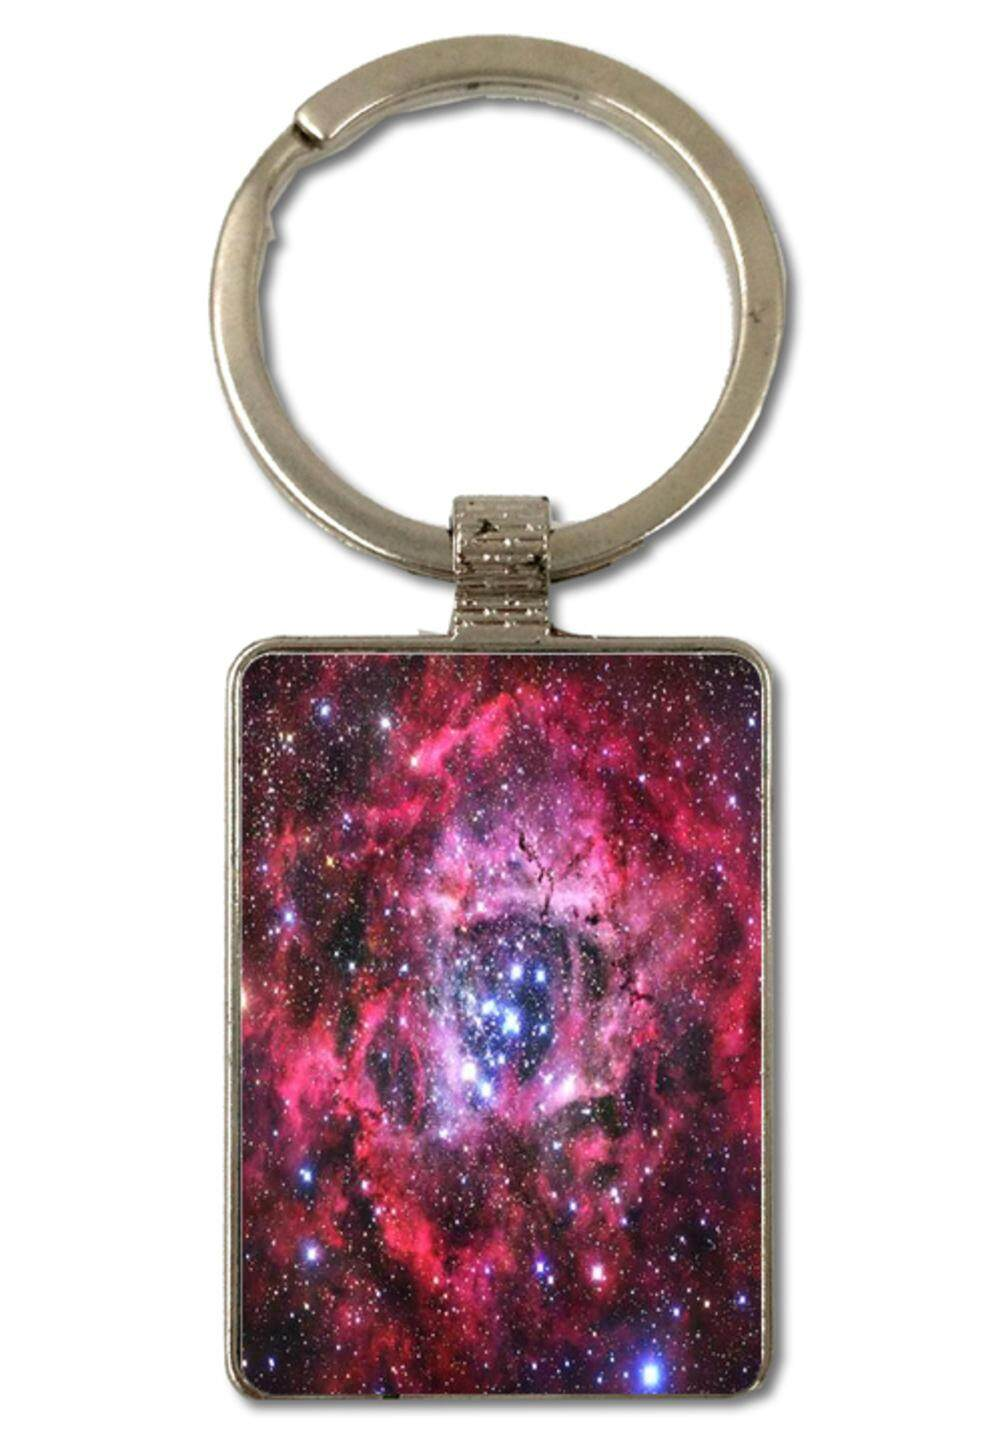 Gantungan Kunci Nebula. Kolase dari Gambar dari Www.nasa.gov _ 141 untuk Gantungan Kunci Pria Kreatif Paduan Logam Keyfob Hadiah Mobil Kunci Lingkaran Rantai kunci Rantai-Internasional